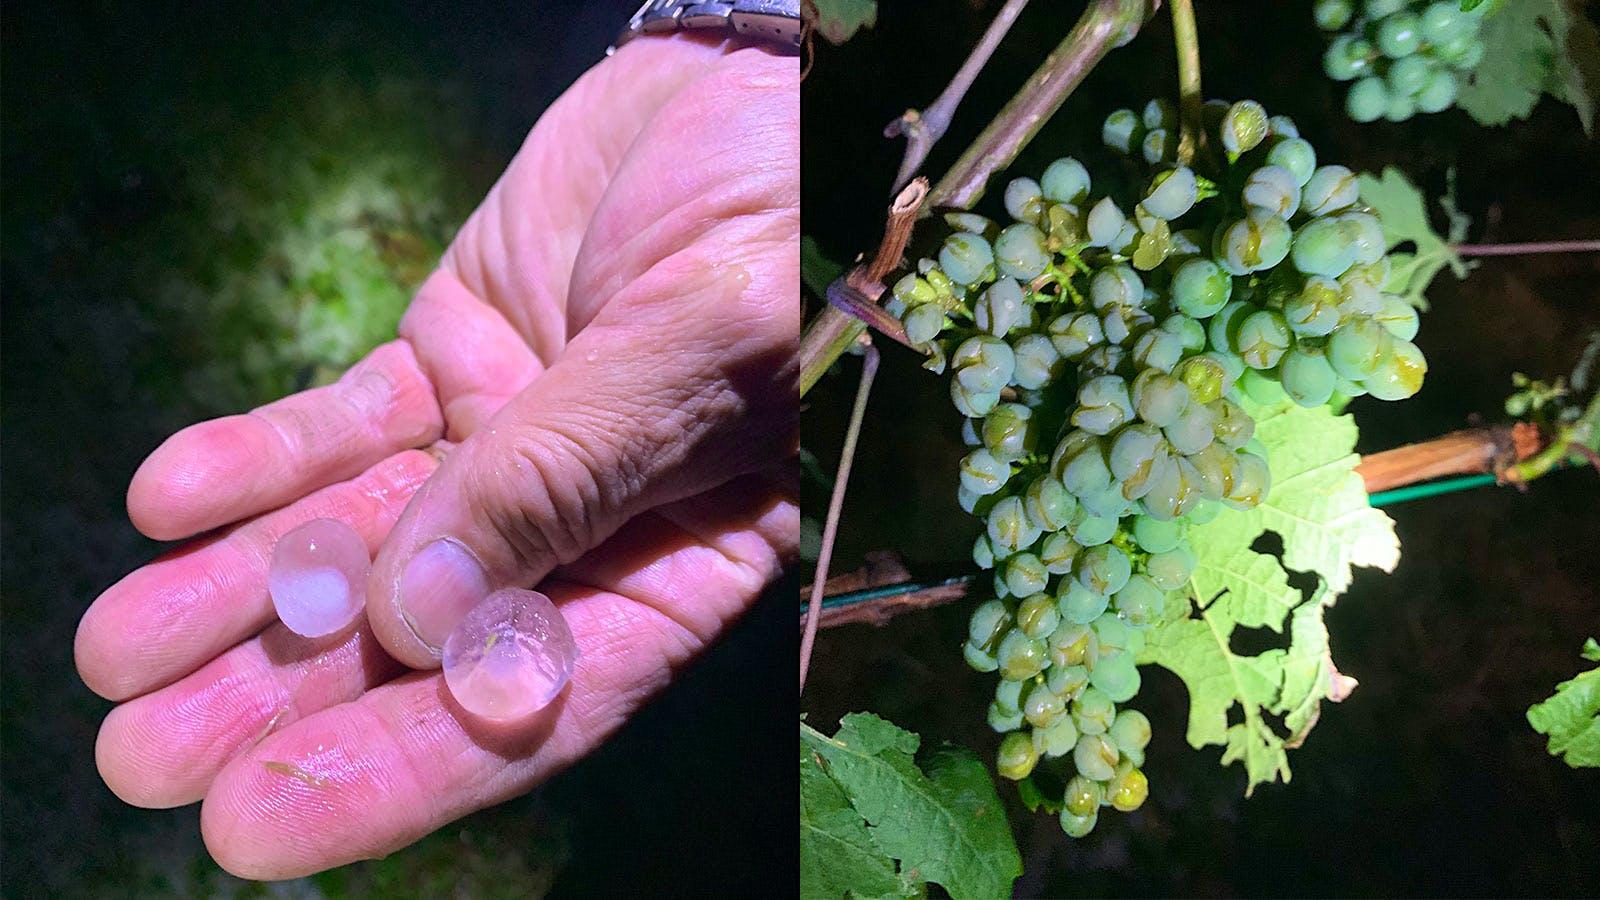 Violent Storms Rip Through Italy's Gattinara Region, Pelting Vines with Hail